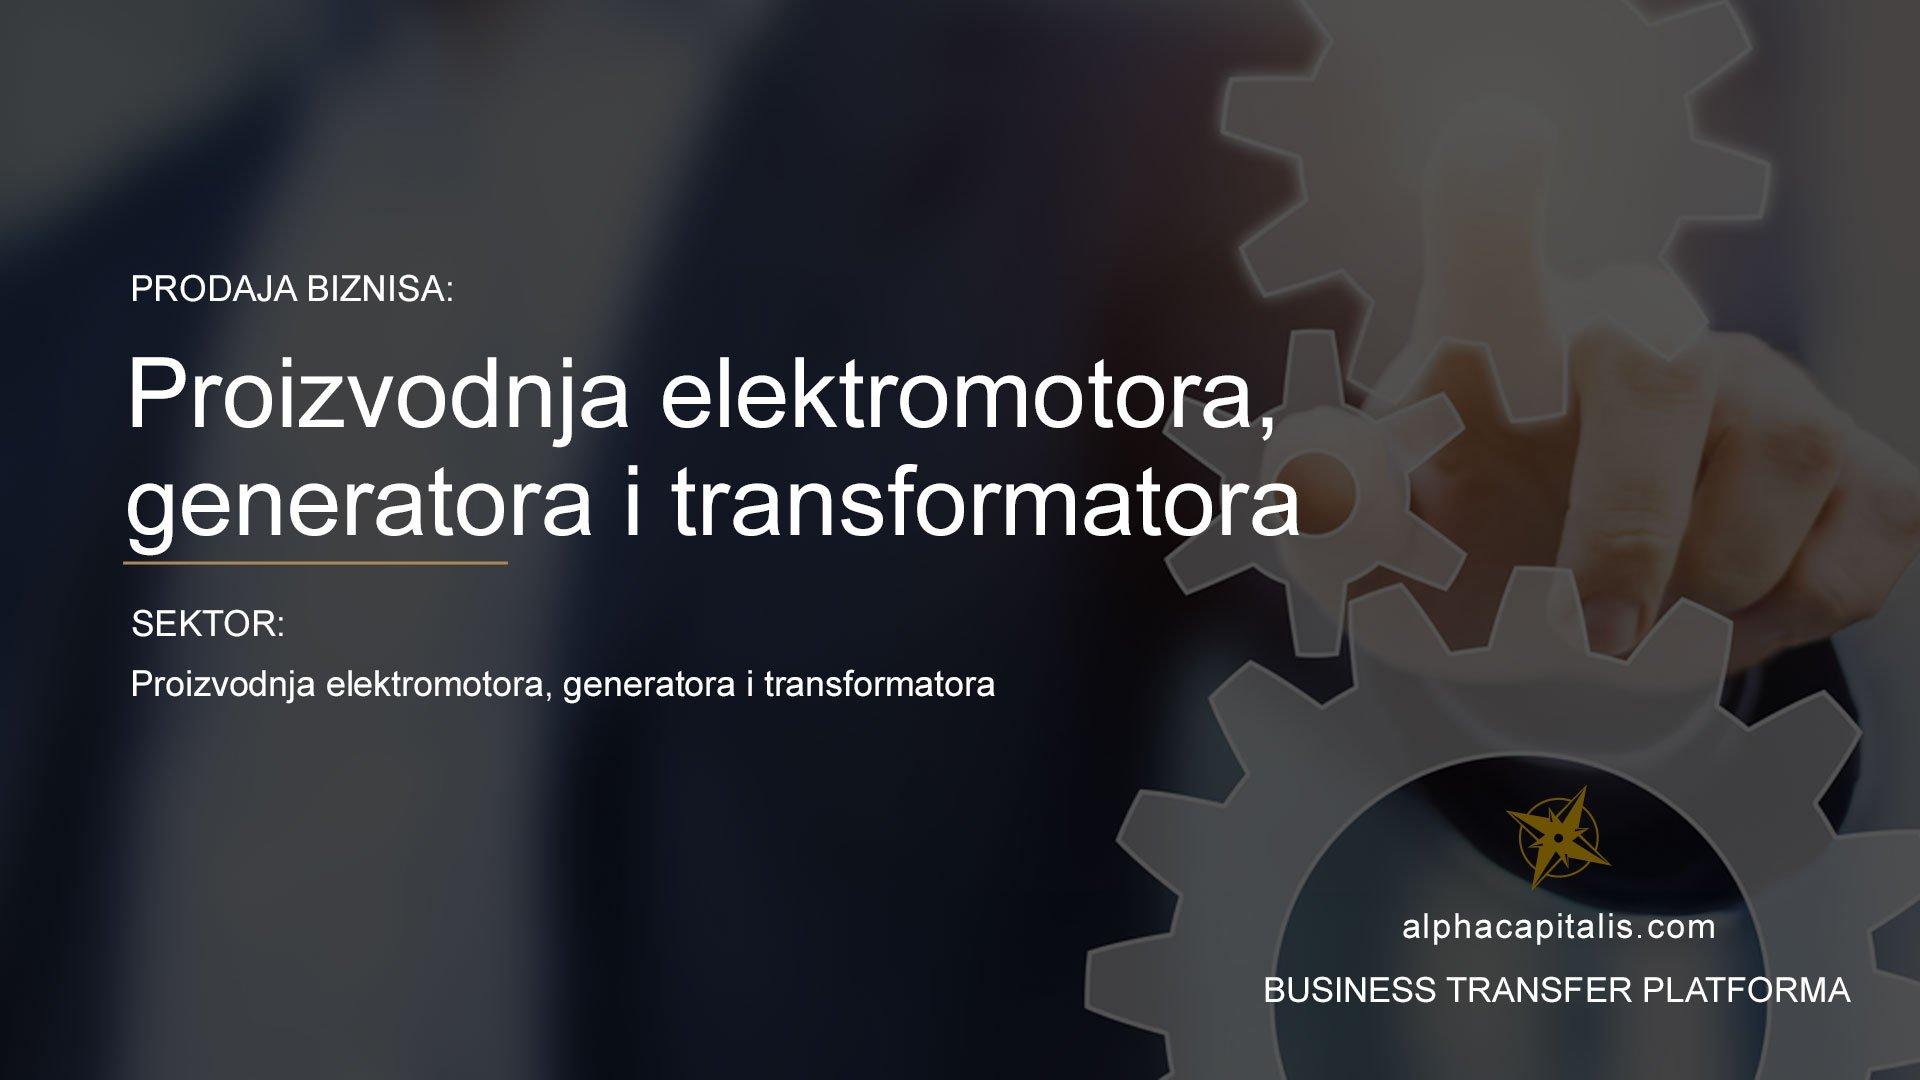 alpha-capitalis-business-transfer-platforma-prodaja-biznisa